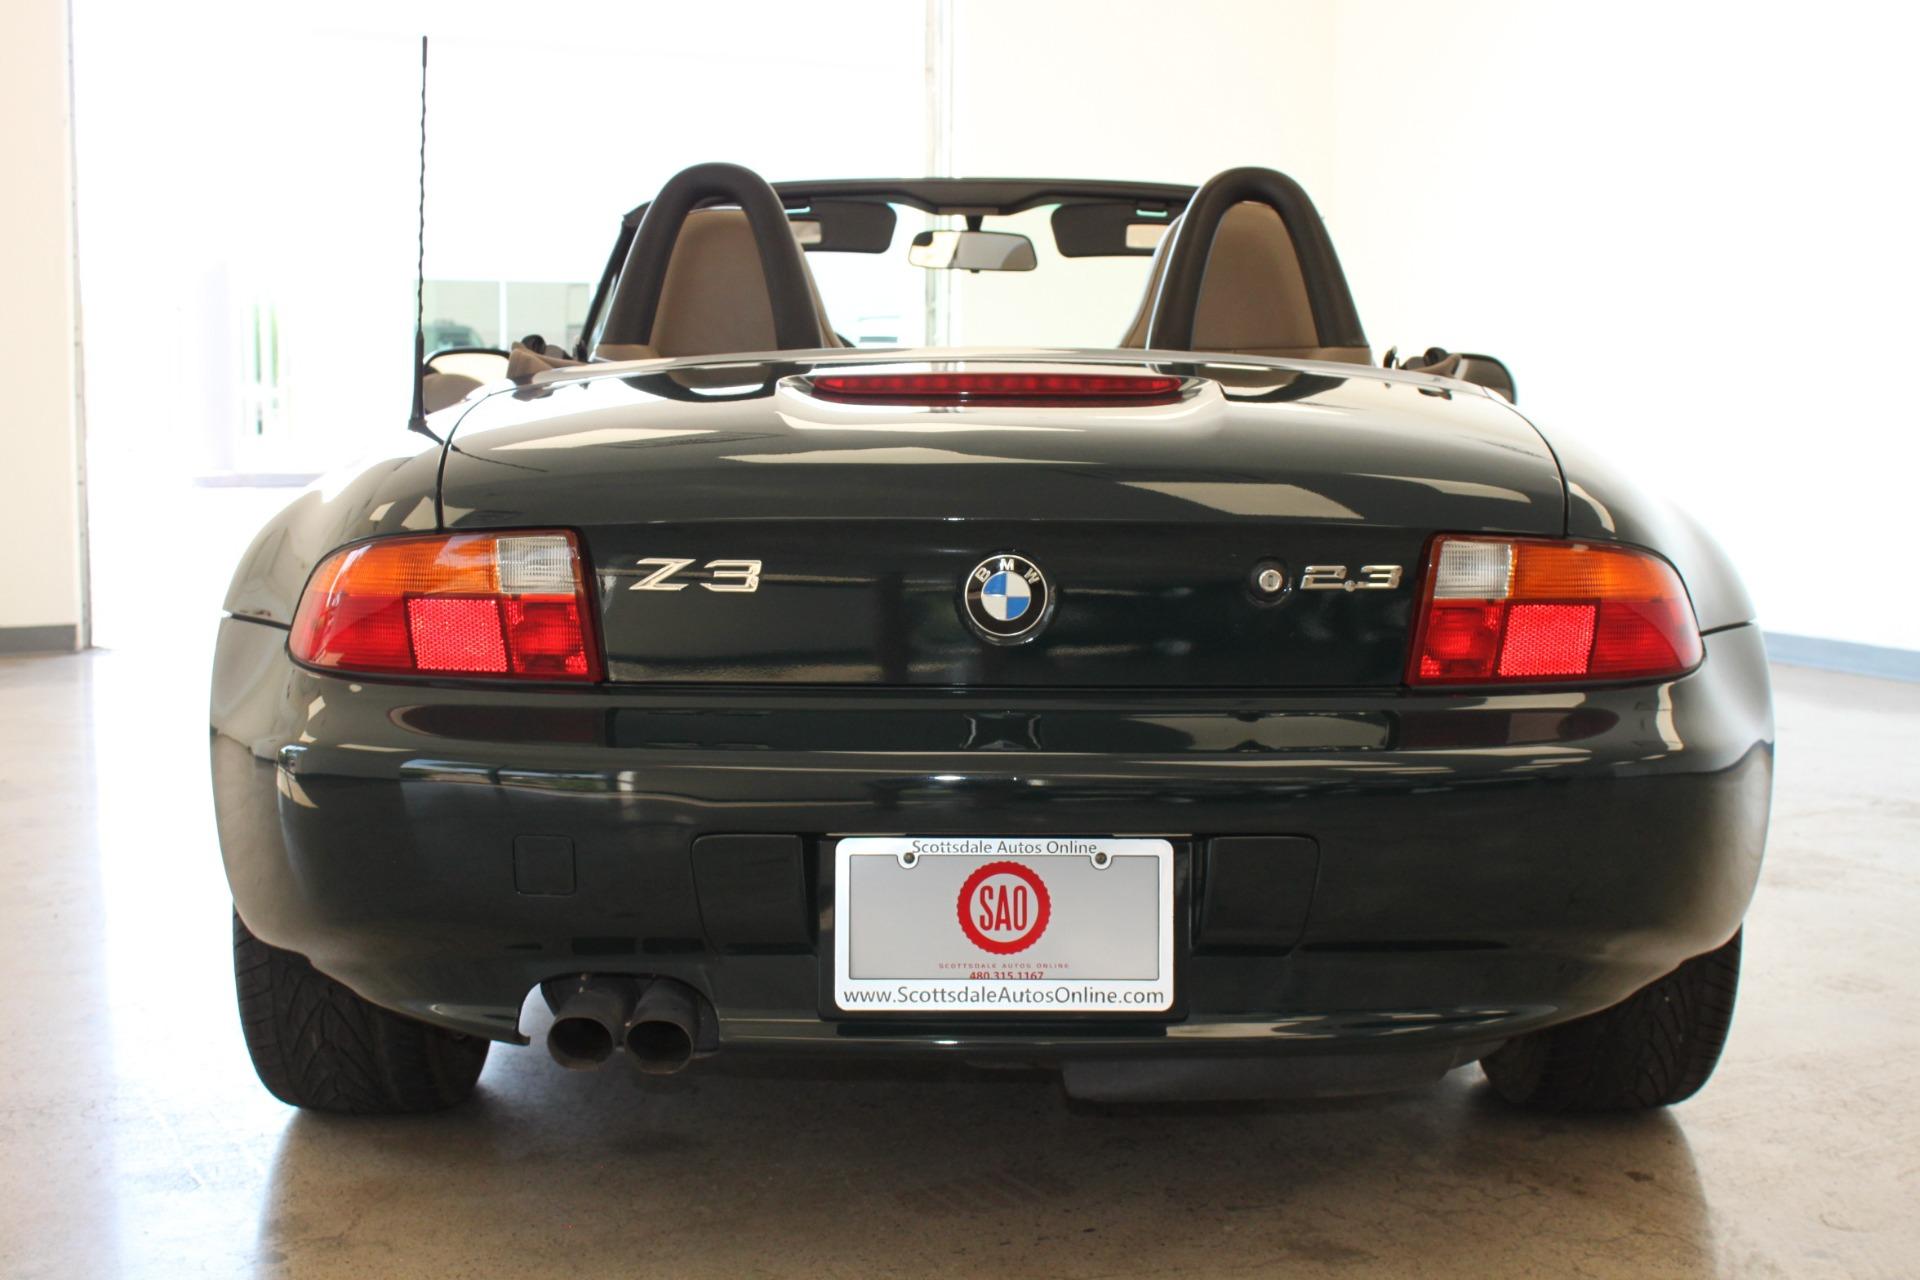 Used-1999-BMW-Z3-25L-Mopar